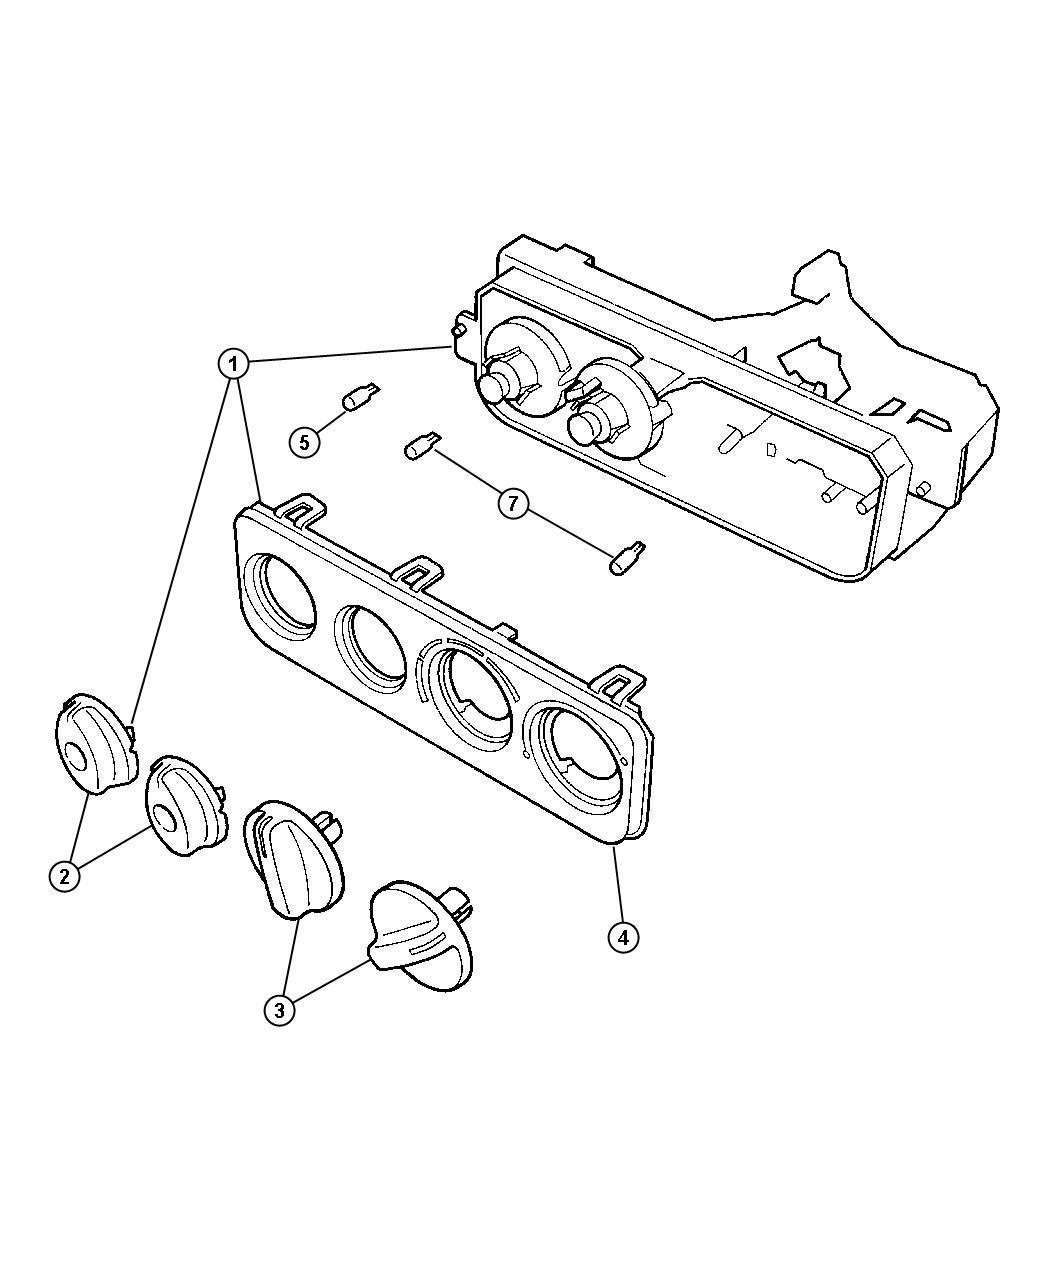 [FM_2545] Wiring Diagram On Peterbilt 379 Air Conditioning